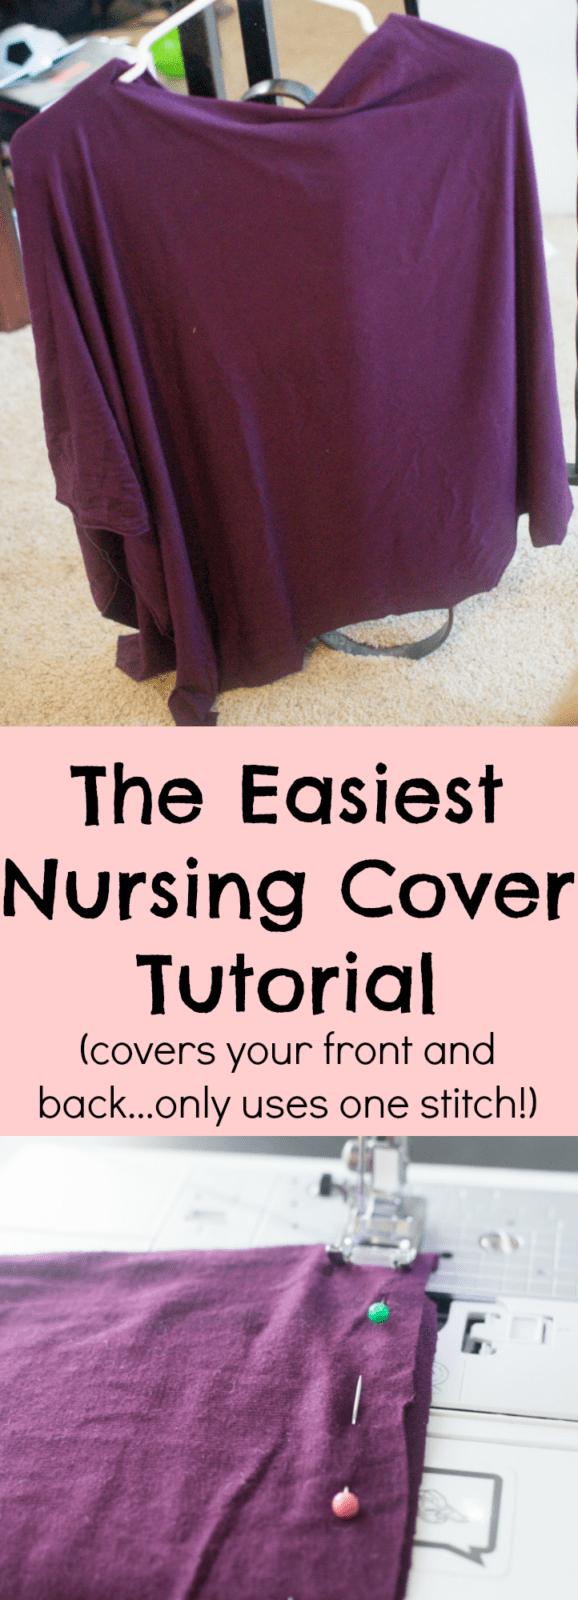 nursing cover / diy nursing cover / easy nursing cover / easy diy nursing cover / breastfeeding cover / poncho nursing cover via @clarkscondensed